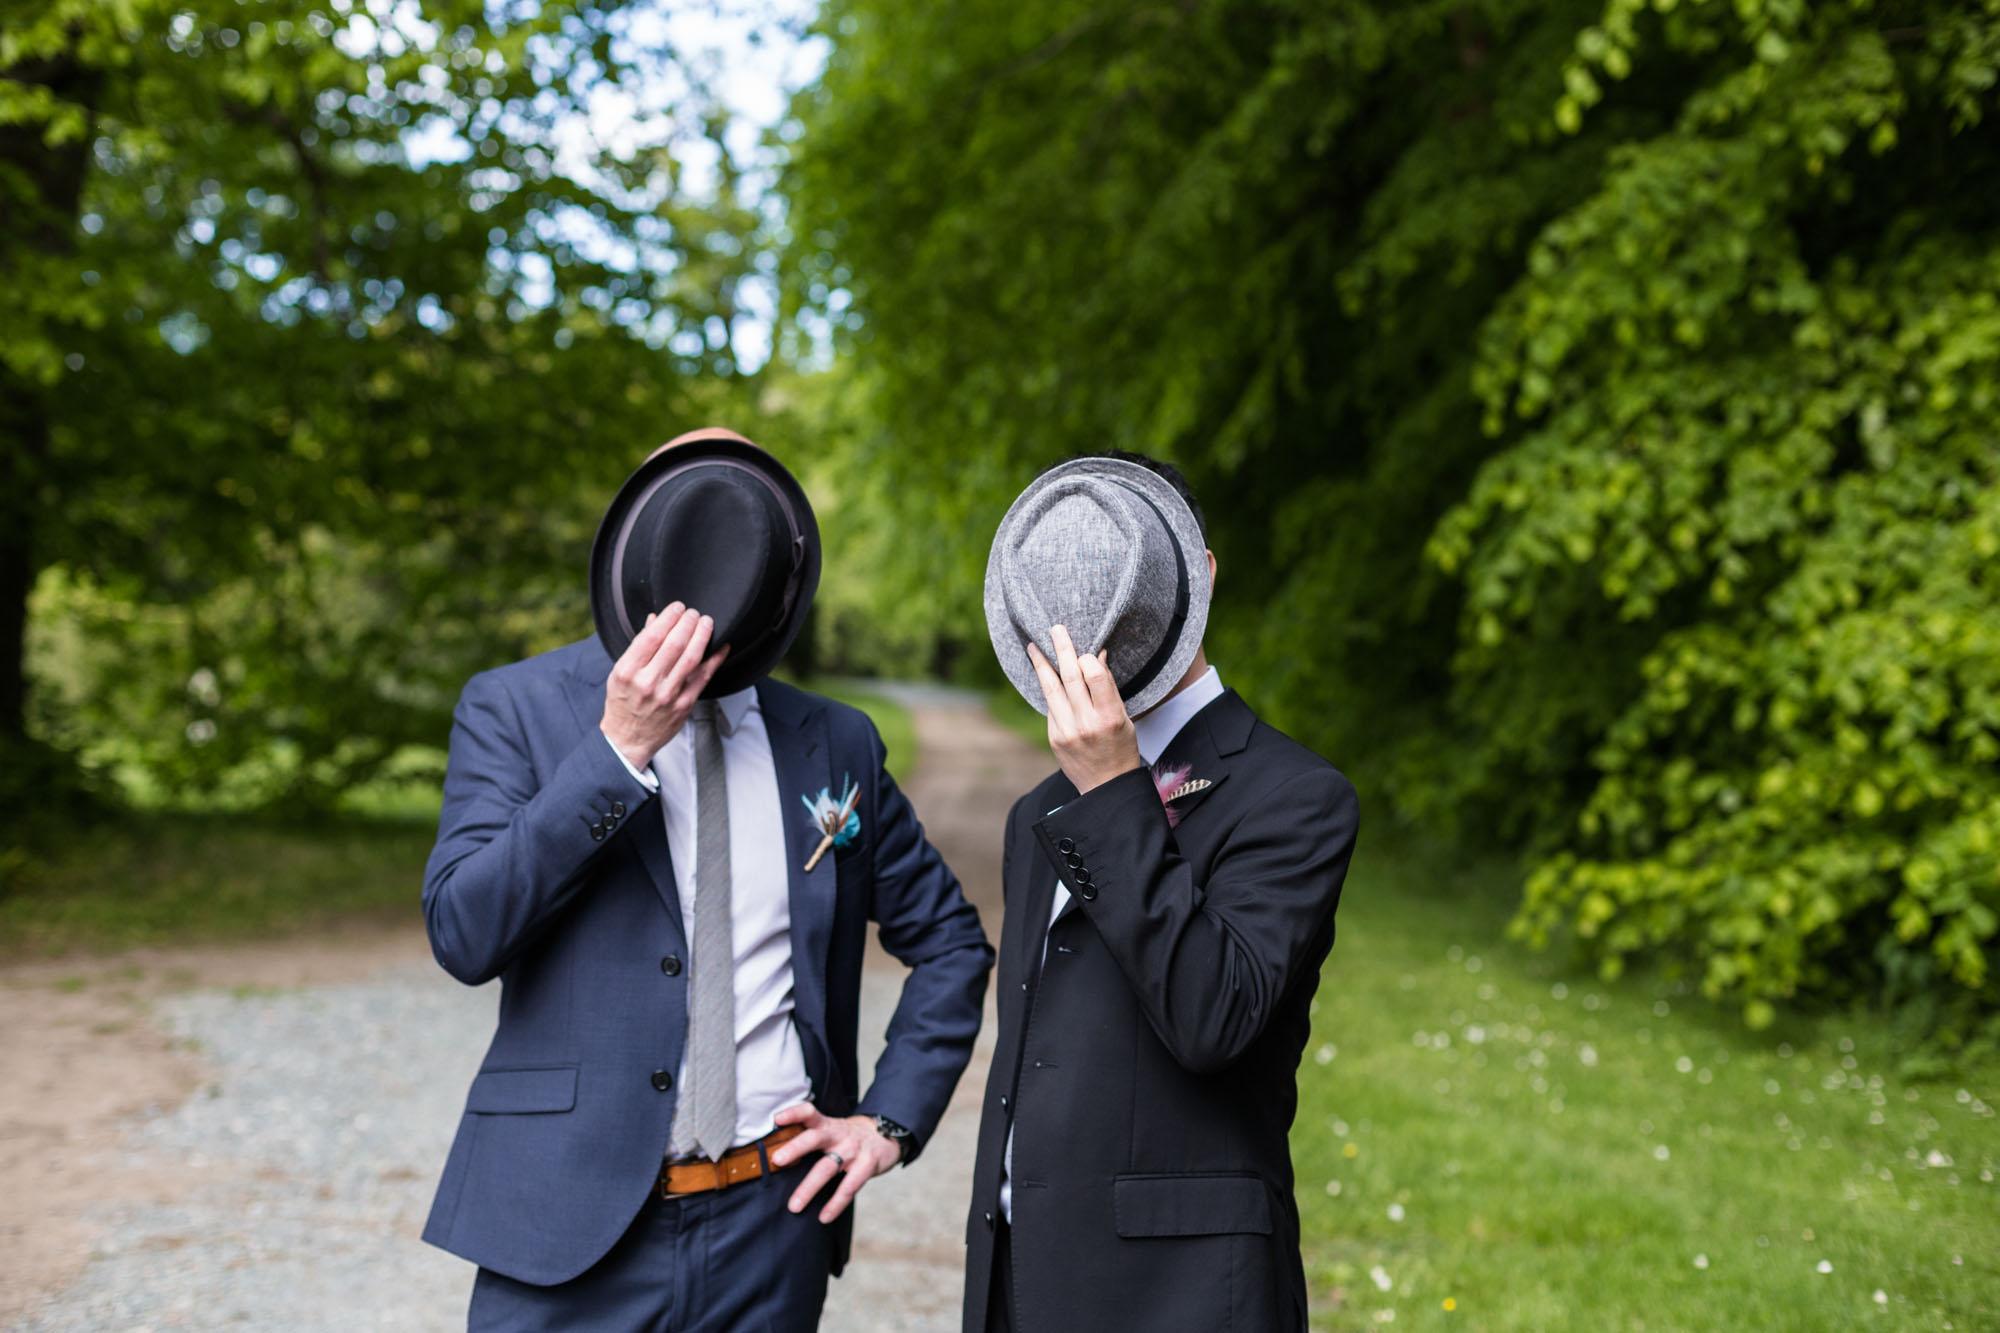 Wedding - FAQs